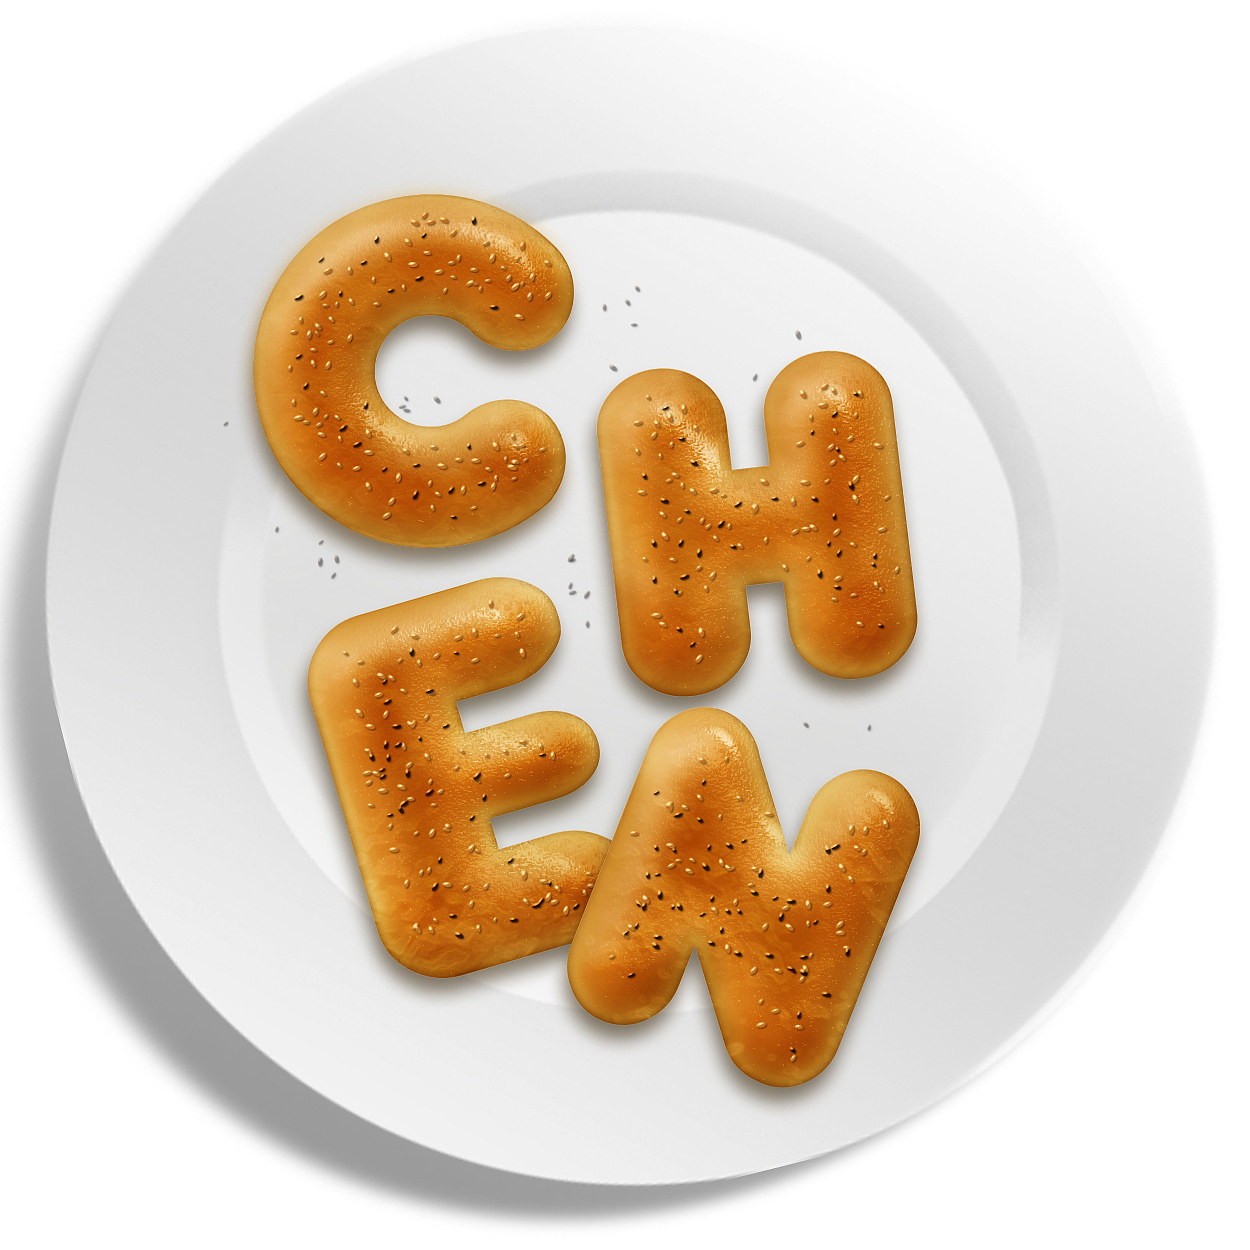 56P Creative Chinese font logo design scheme #.1265